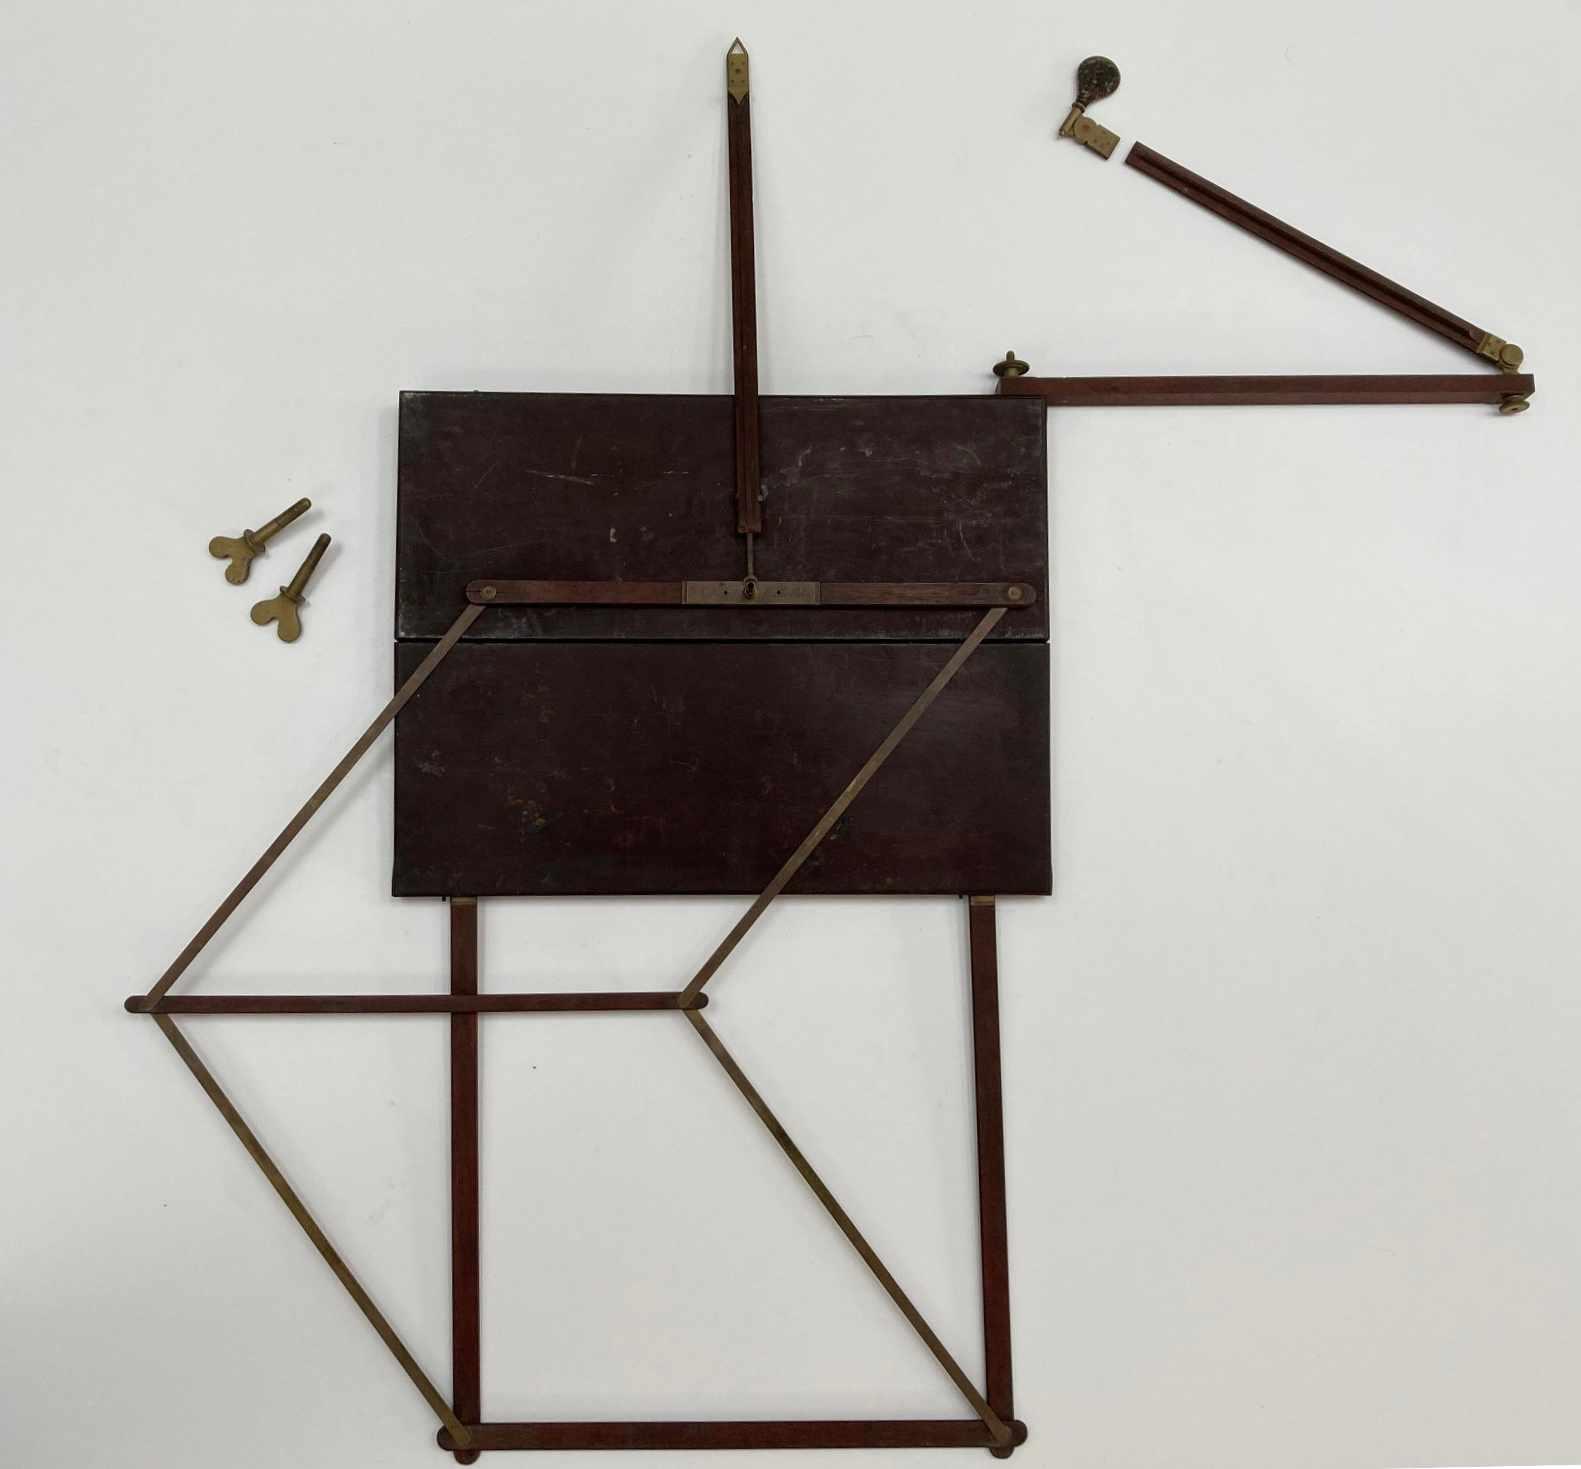 Eighteenth Century James Watt Perspective Machine by John Miller of Edinburgh